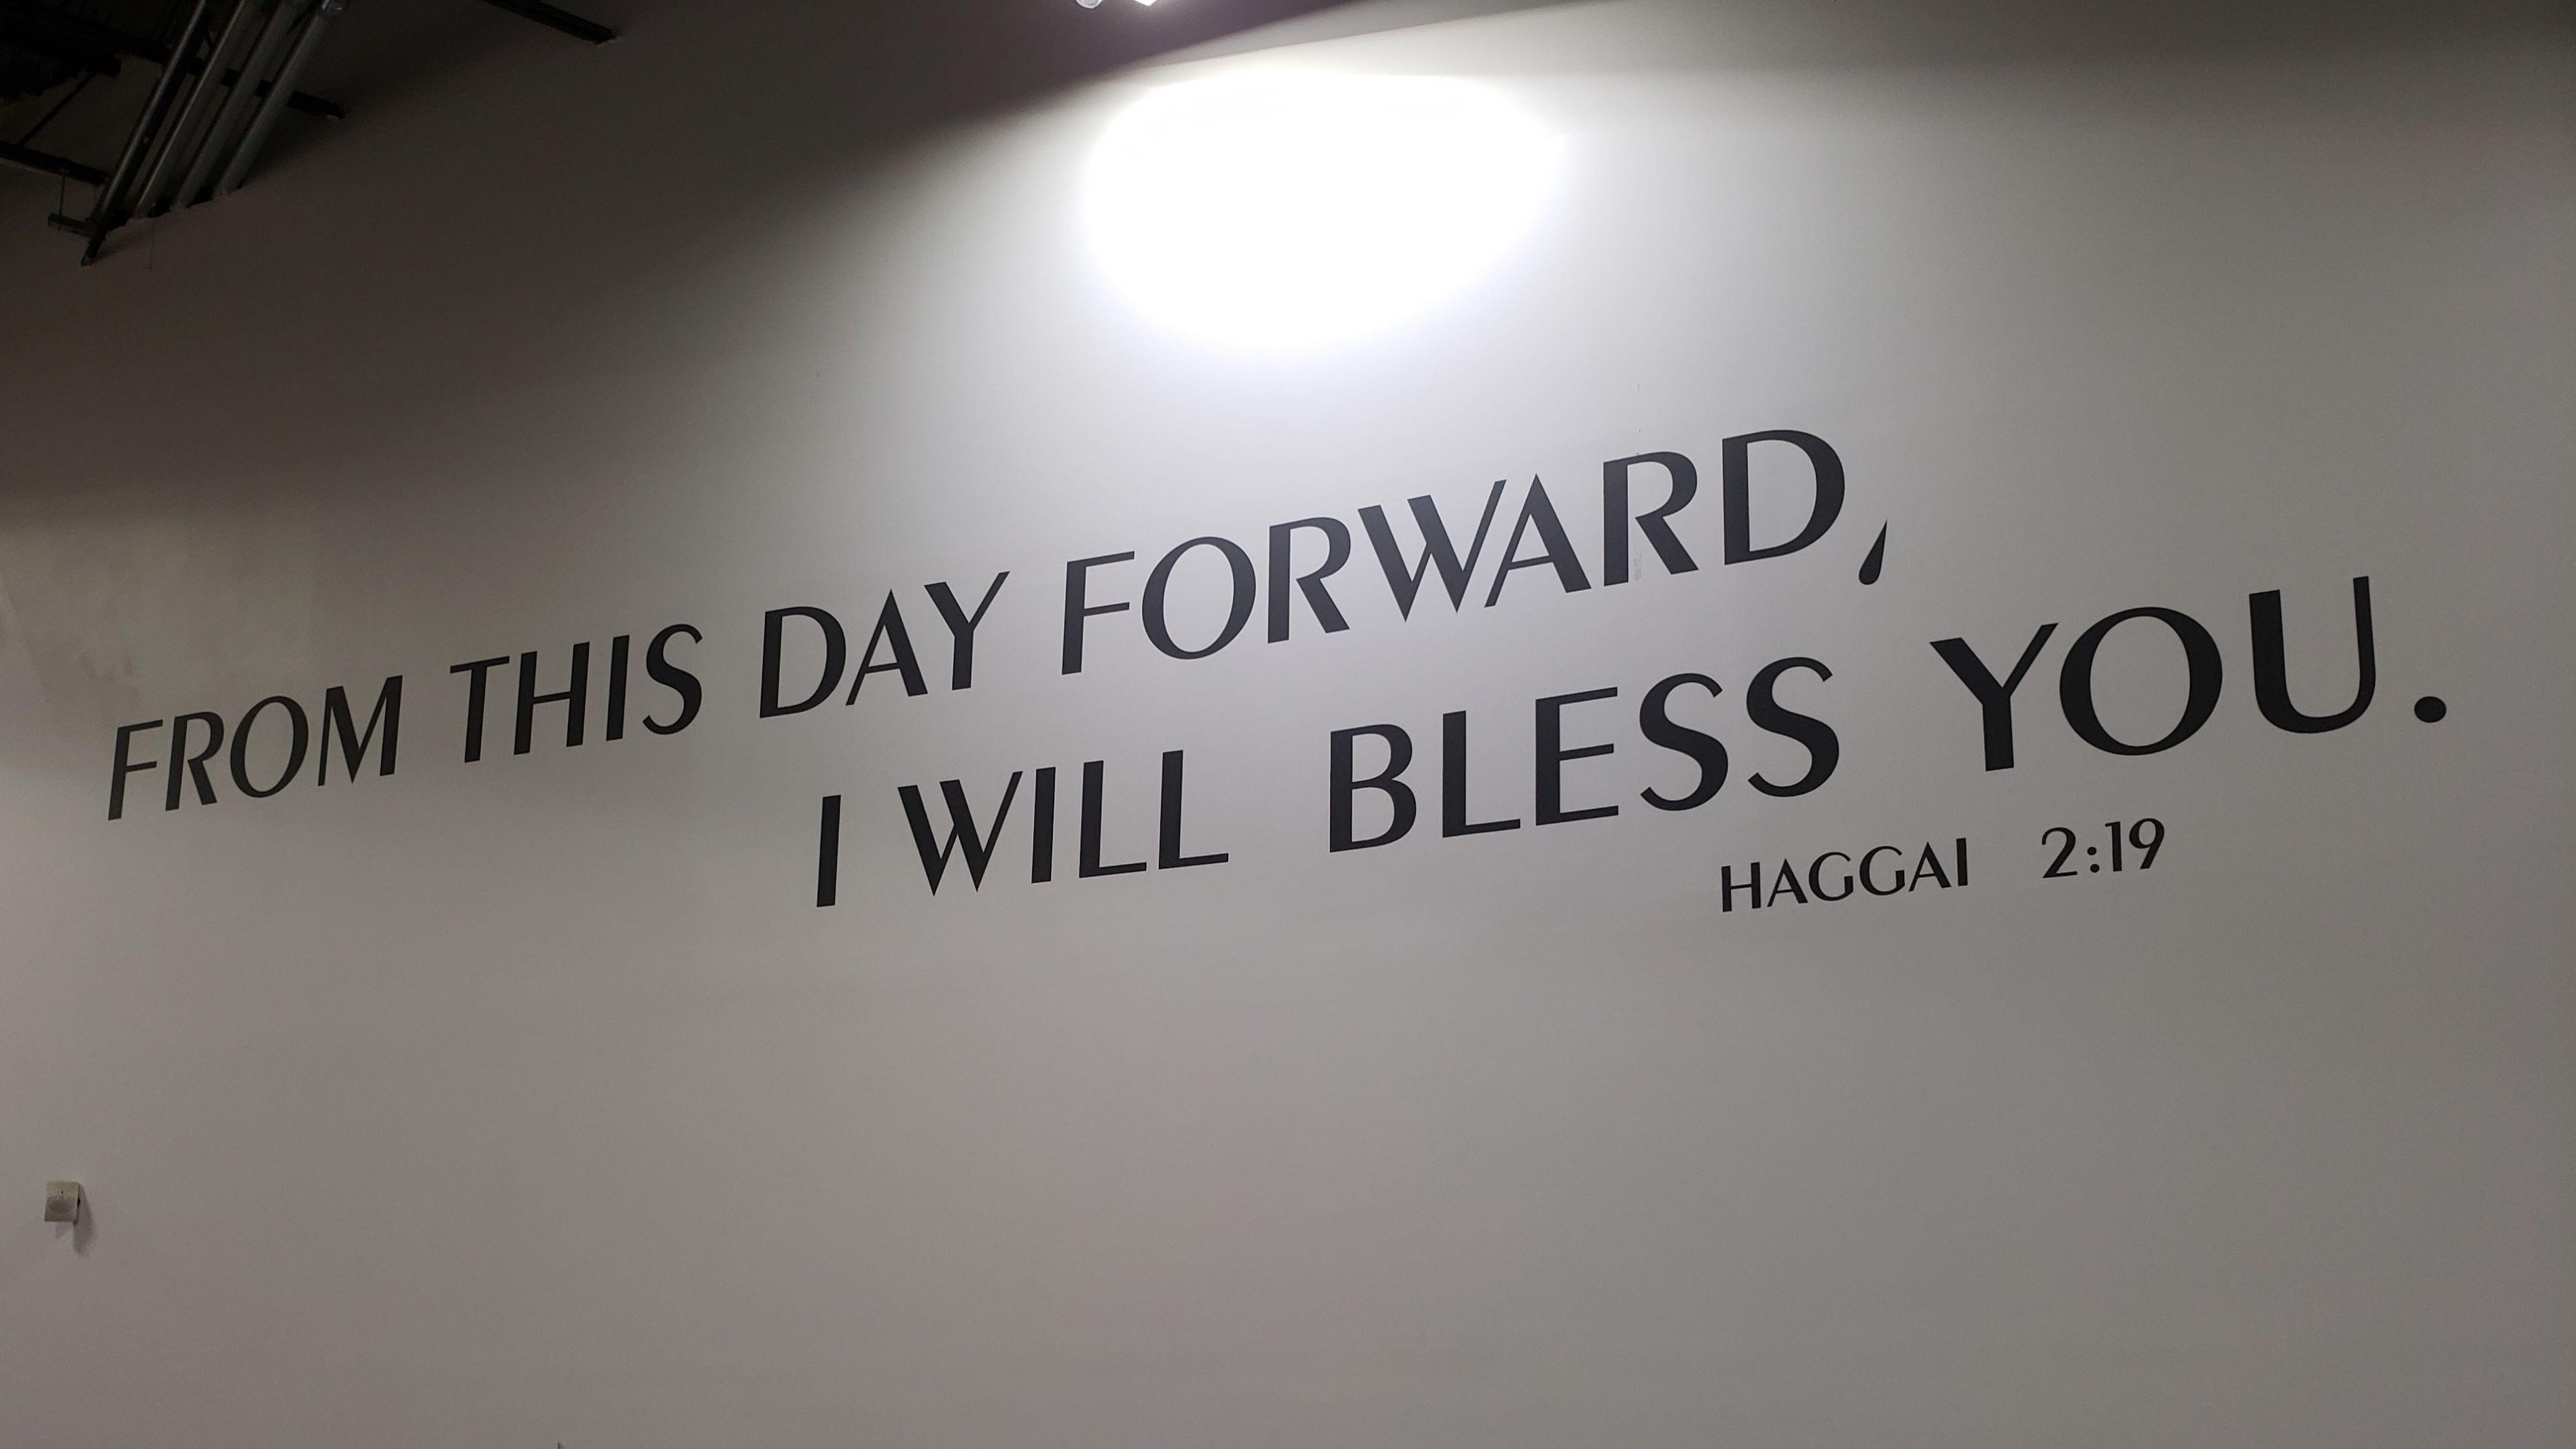 Haggai 2:19 wall